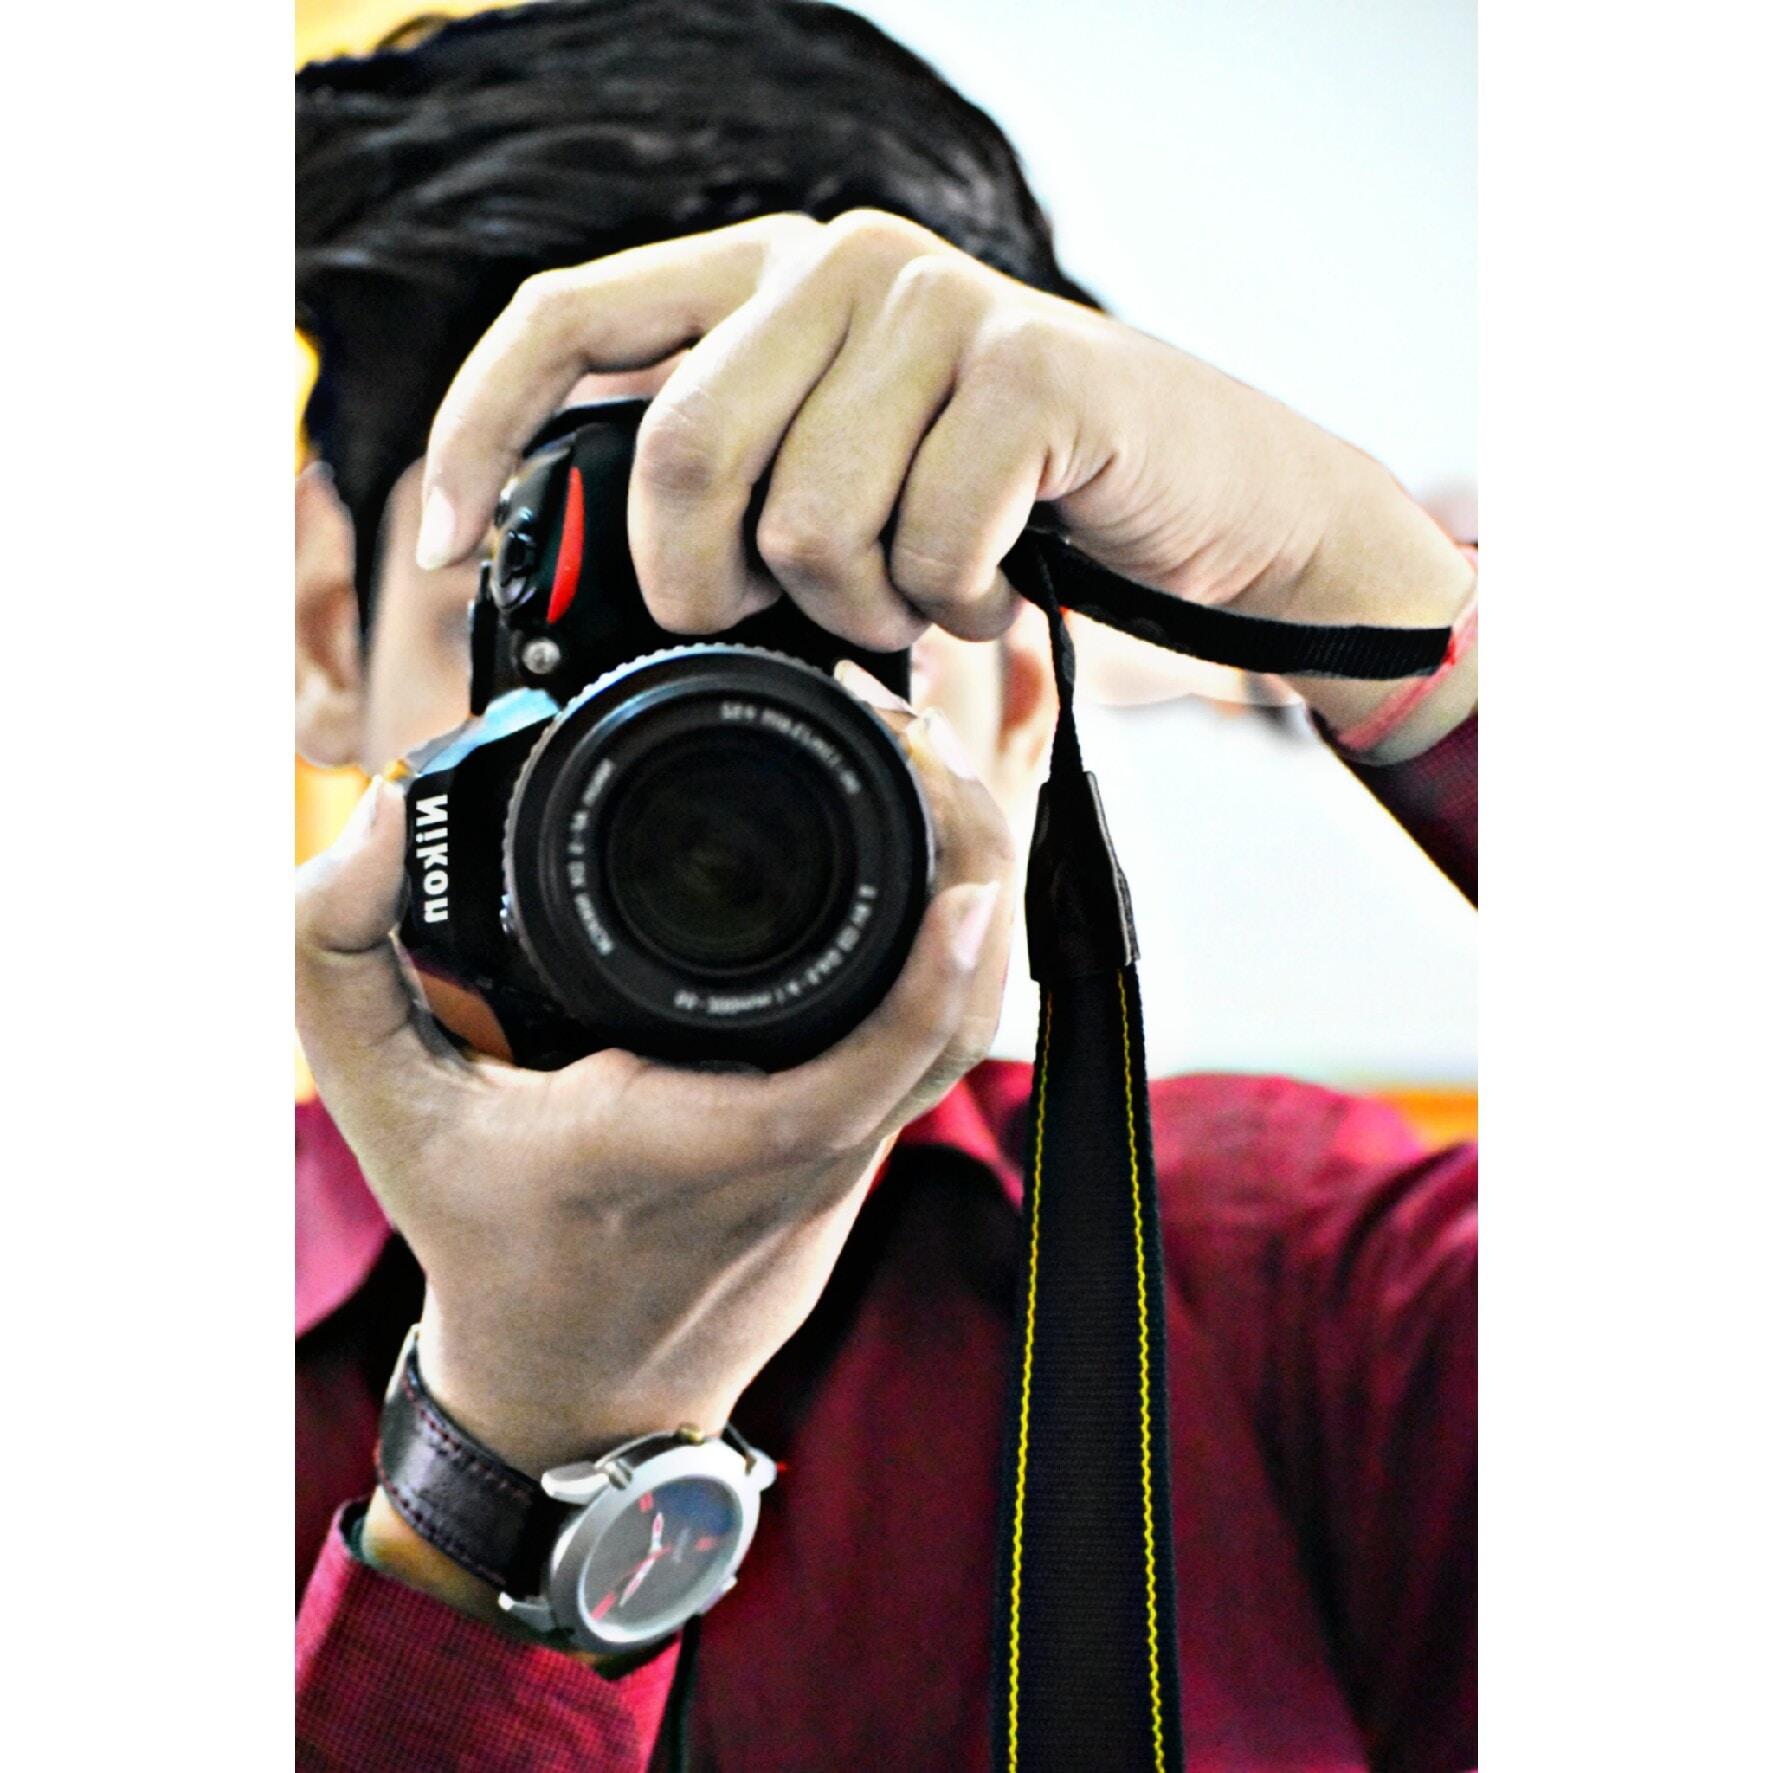 Go to Gourav Pareek's profile